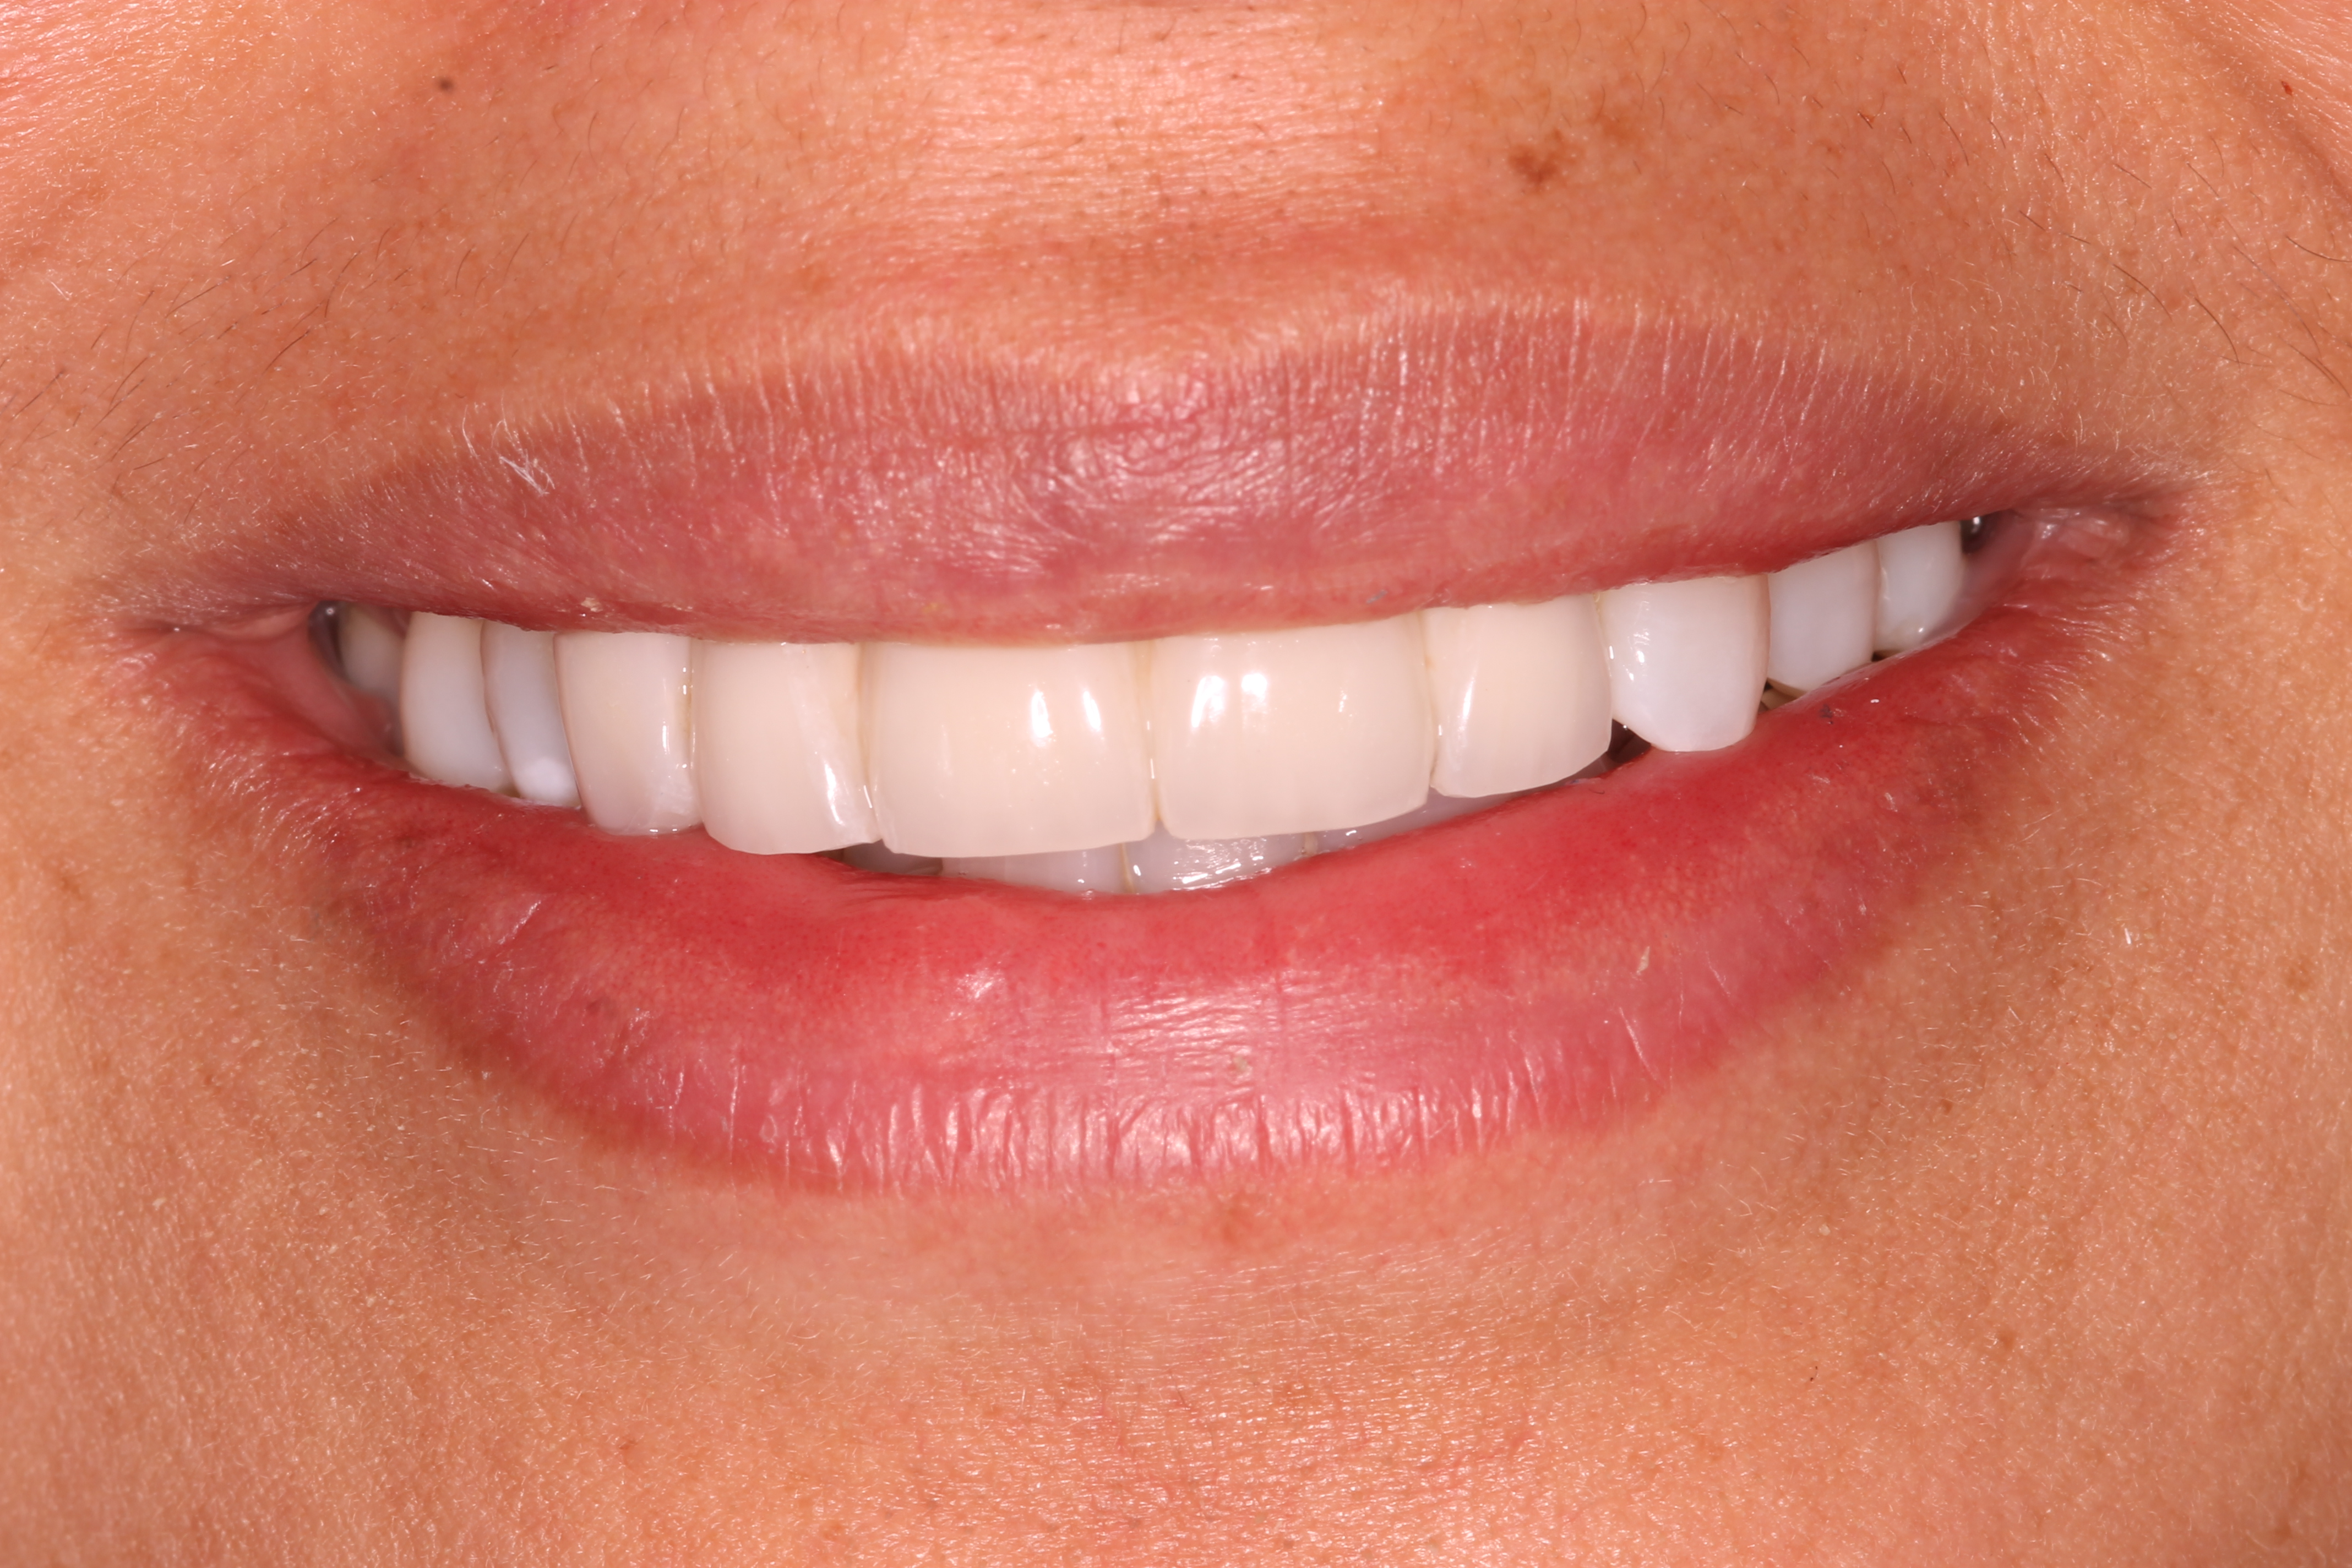 Natural-looking dental implants